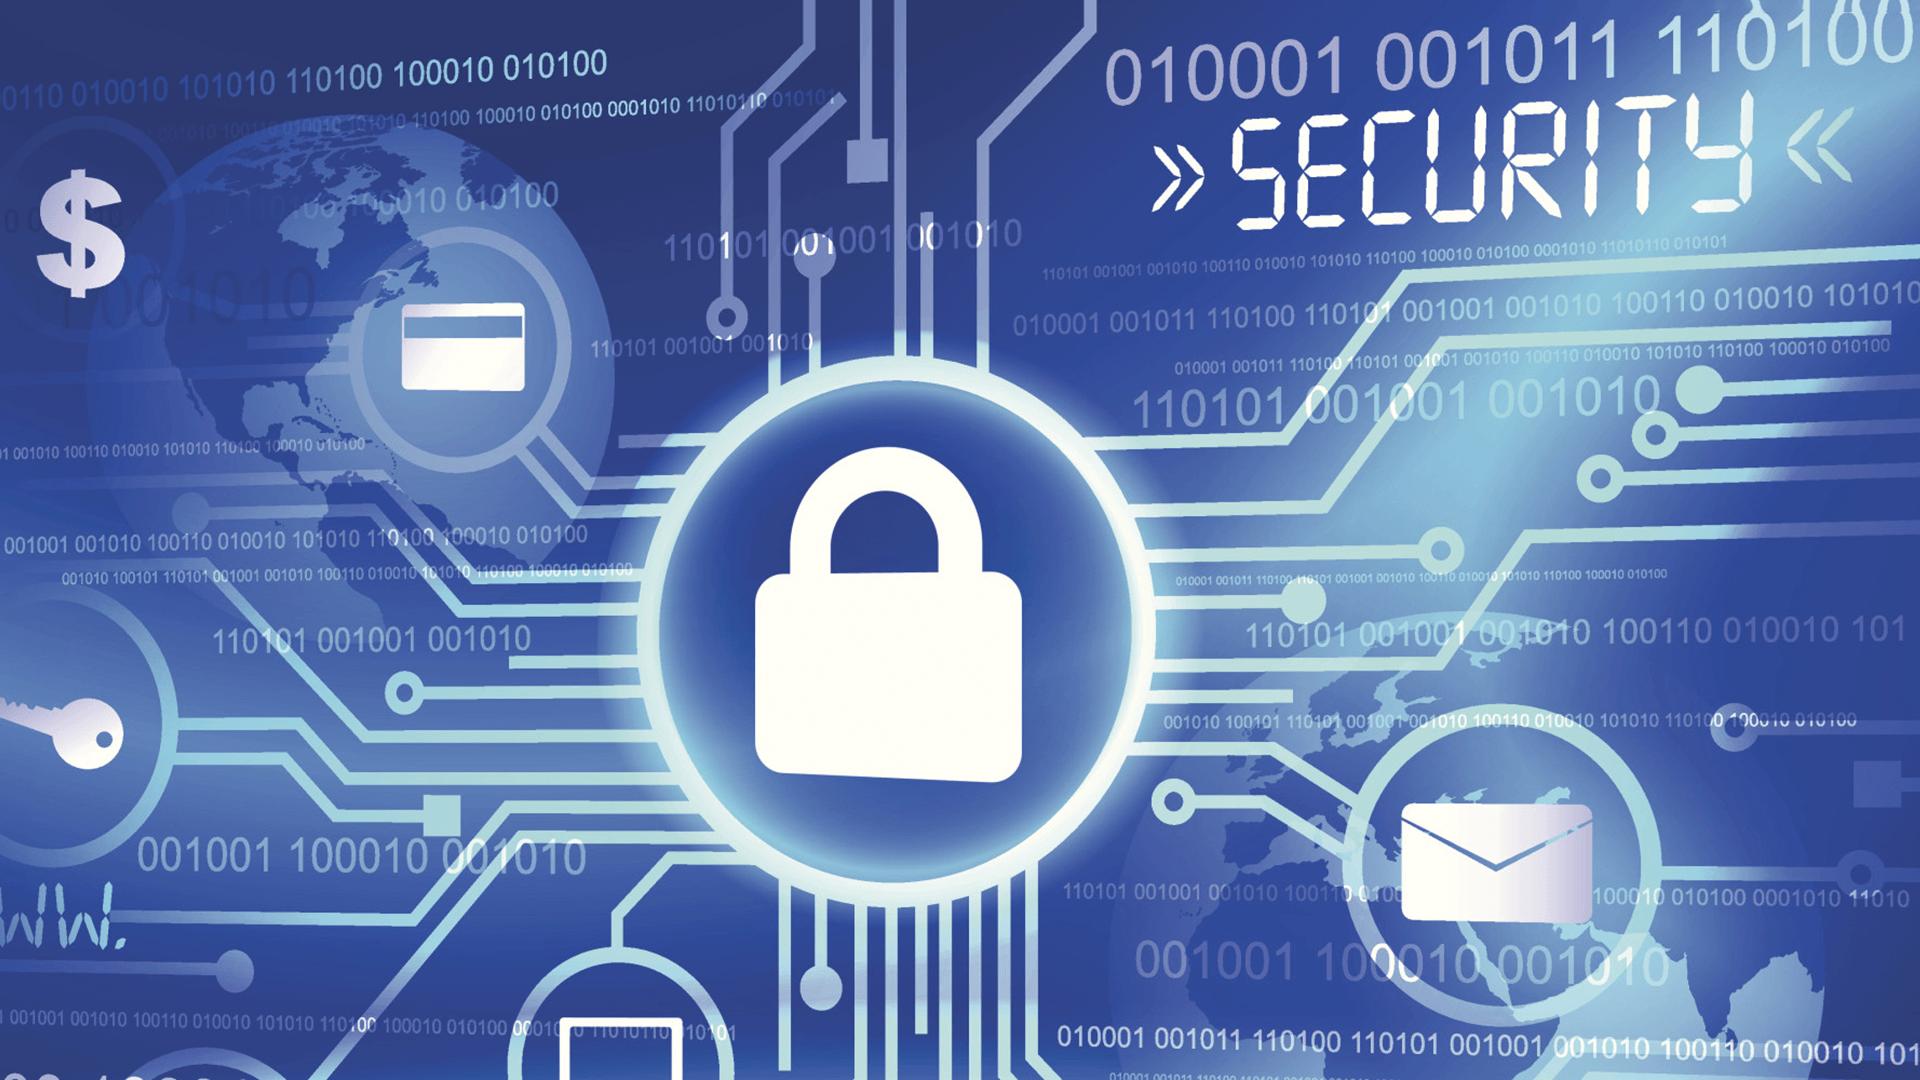 TLS 1.3 Overview of Security Properties